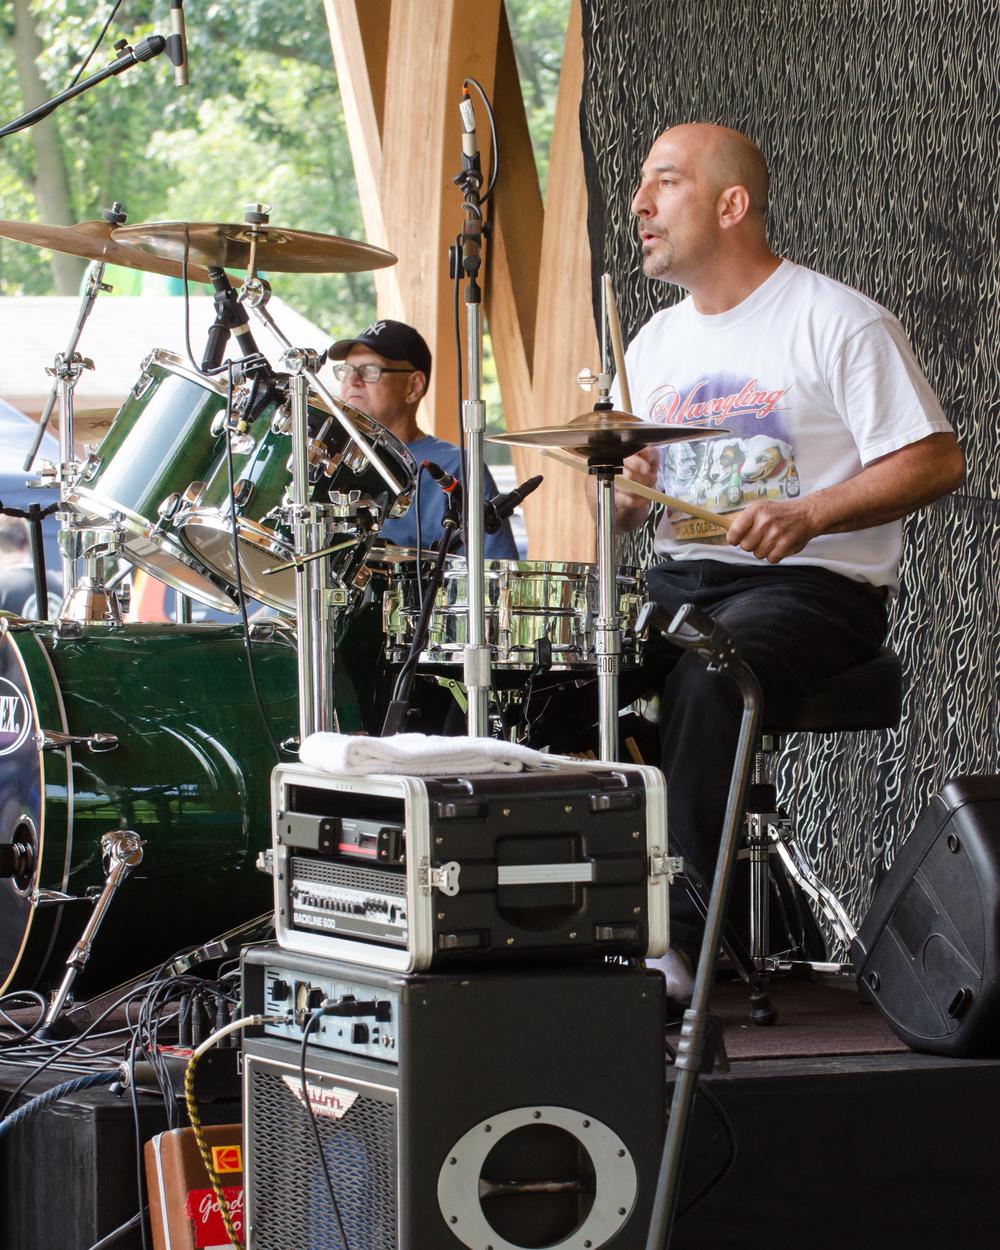 Fleetwood_Blues_Festival_2013-08-11_-55.jpg